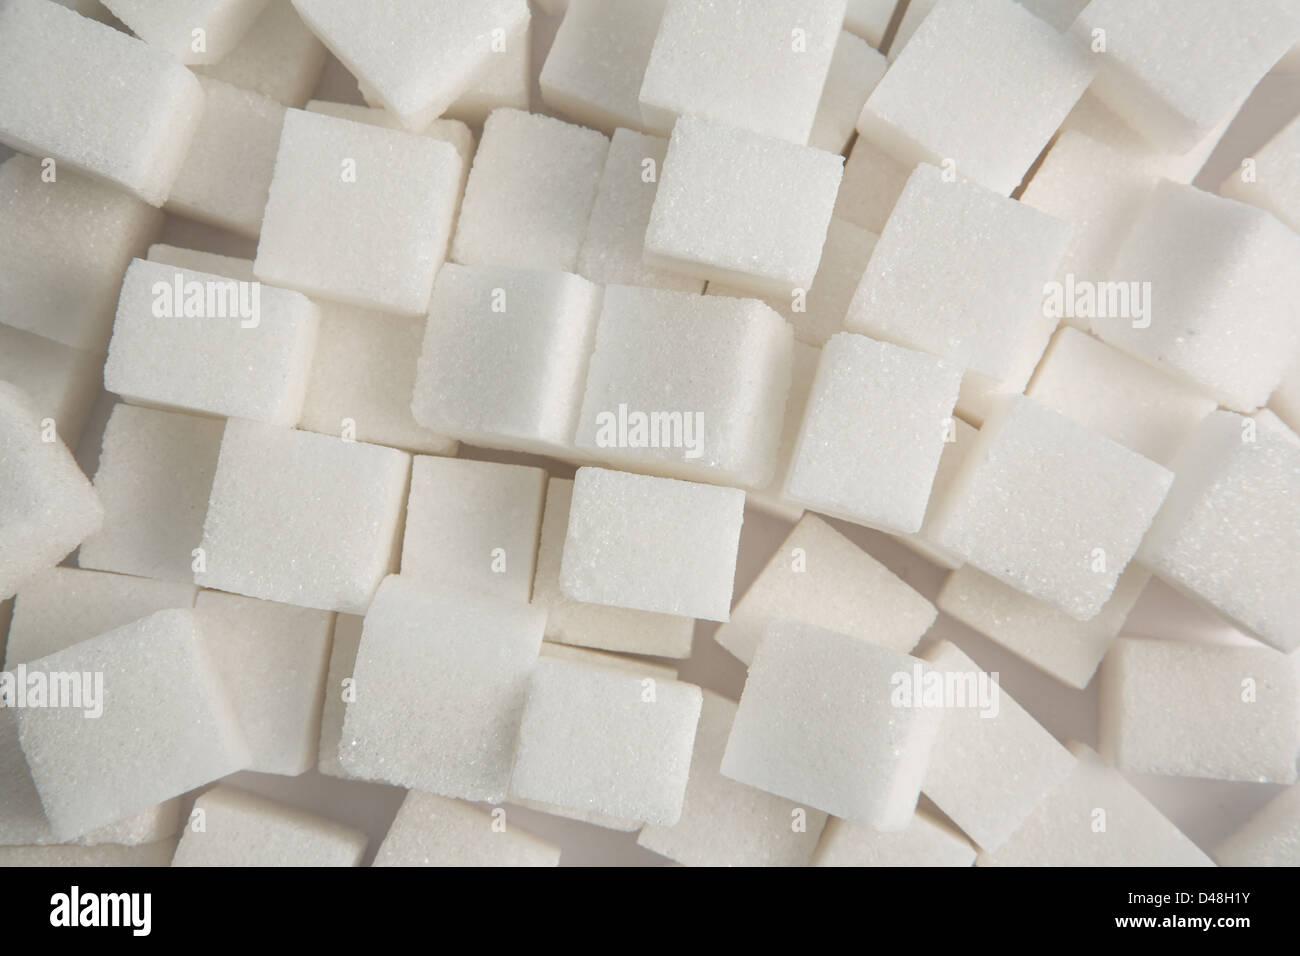 Sugar lumps - Stock Image